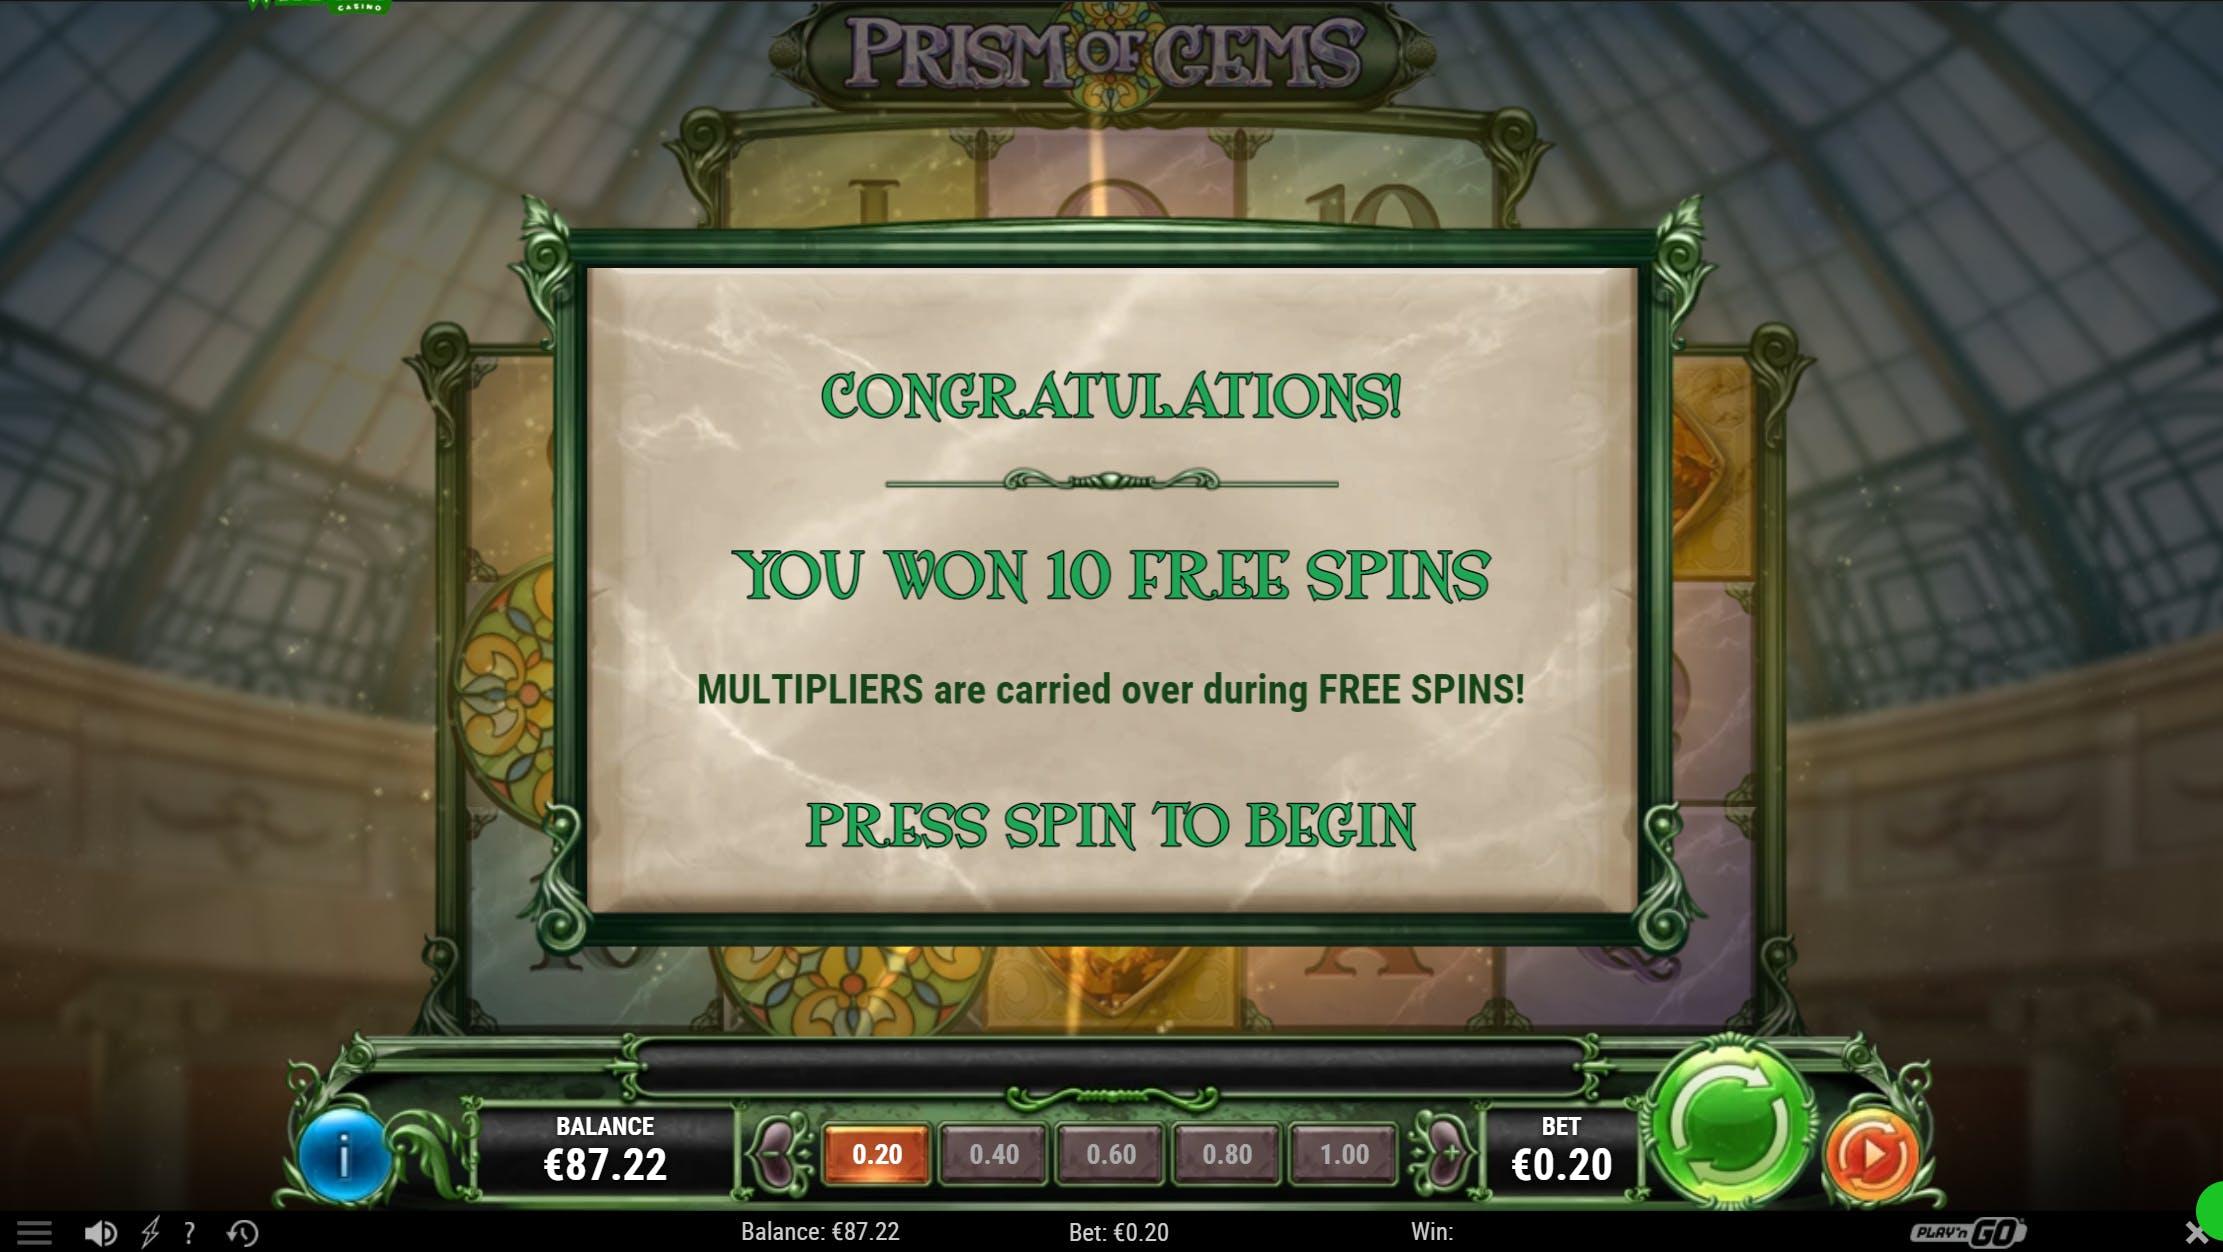 winoui casino bonus sur prism of gems de playngo